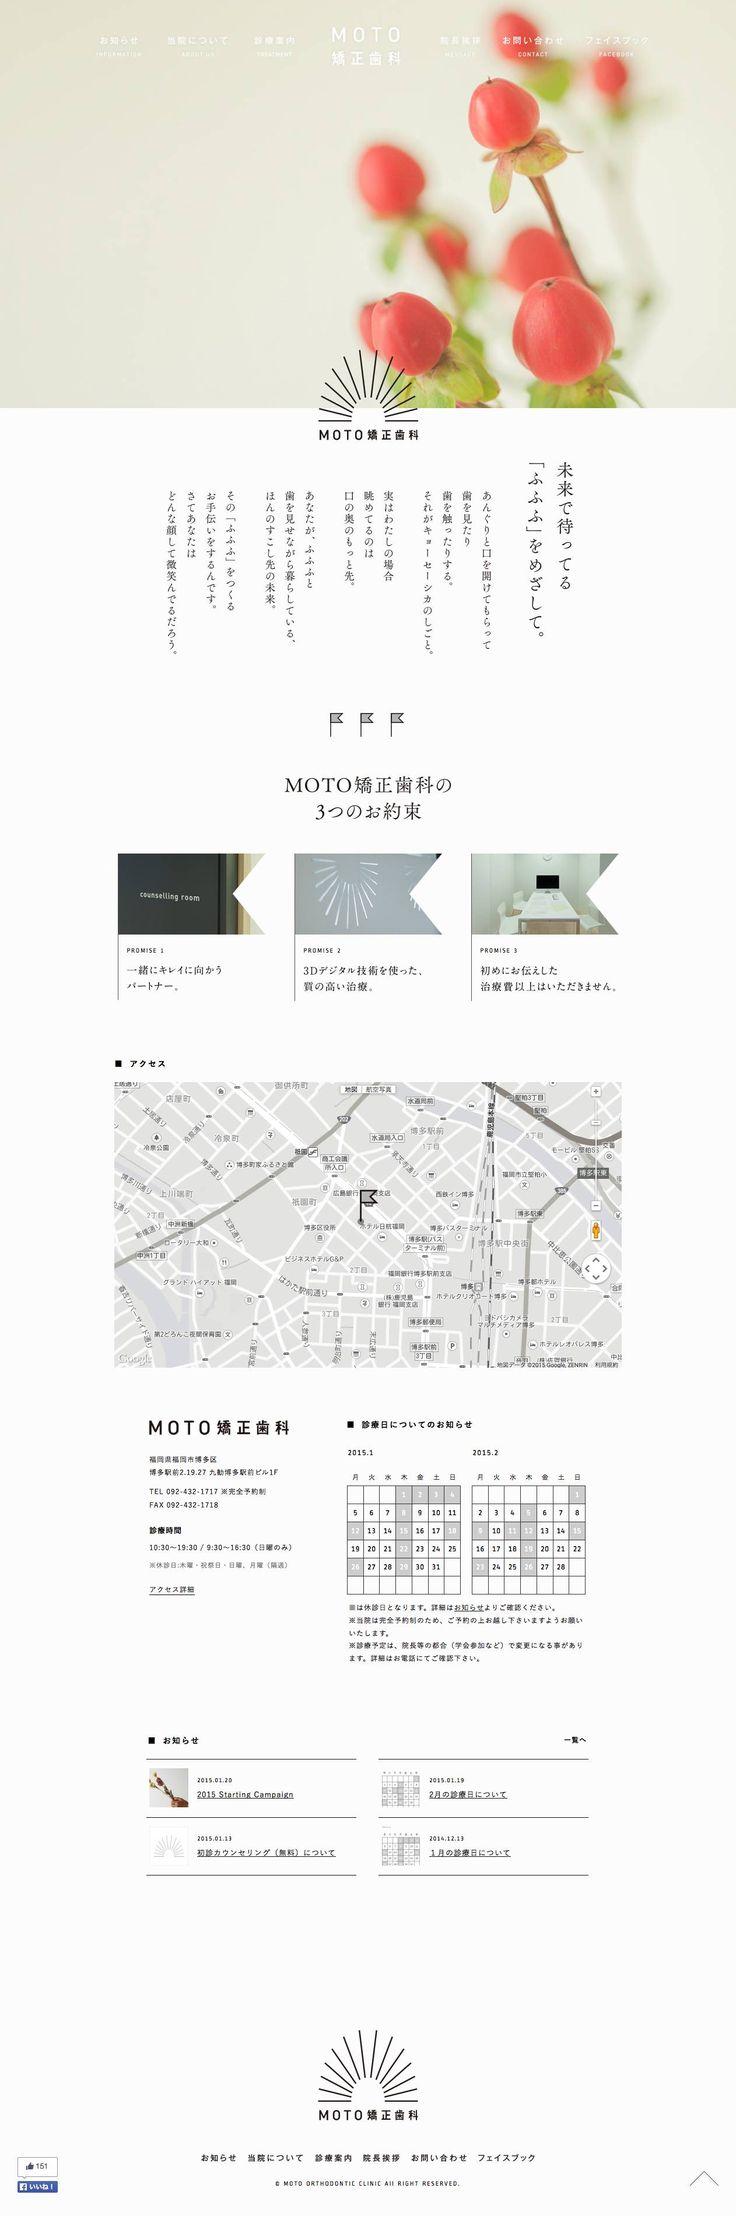 http://moto-od.jp/